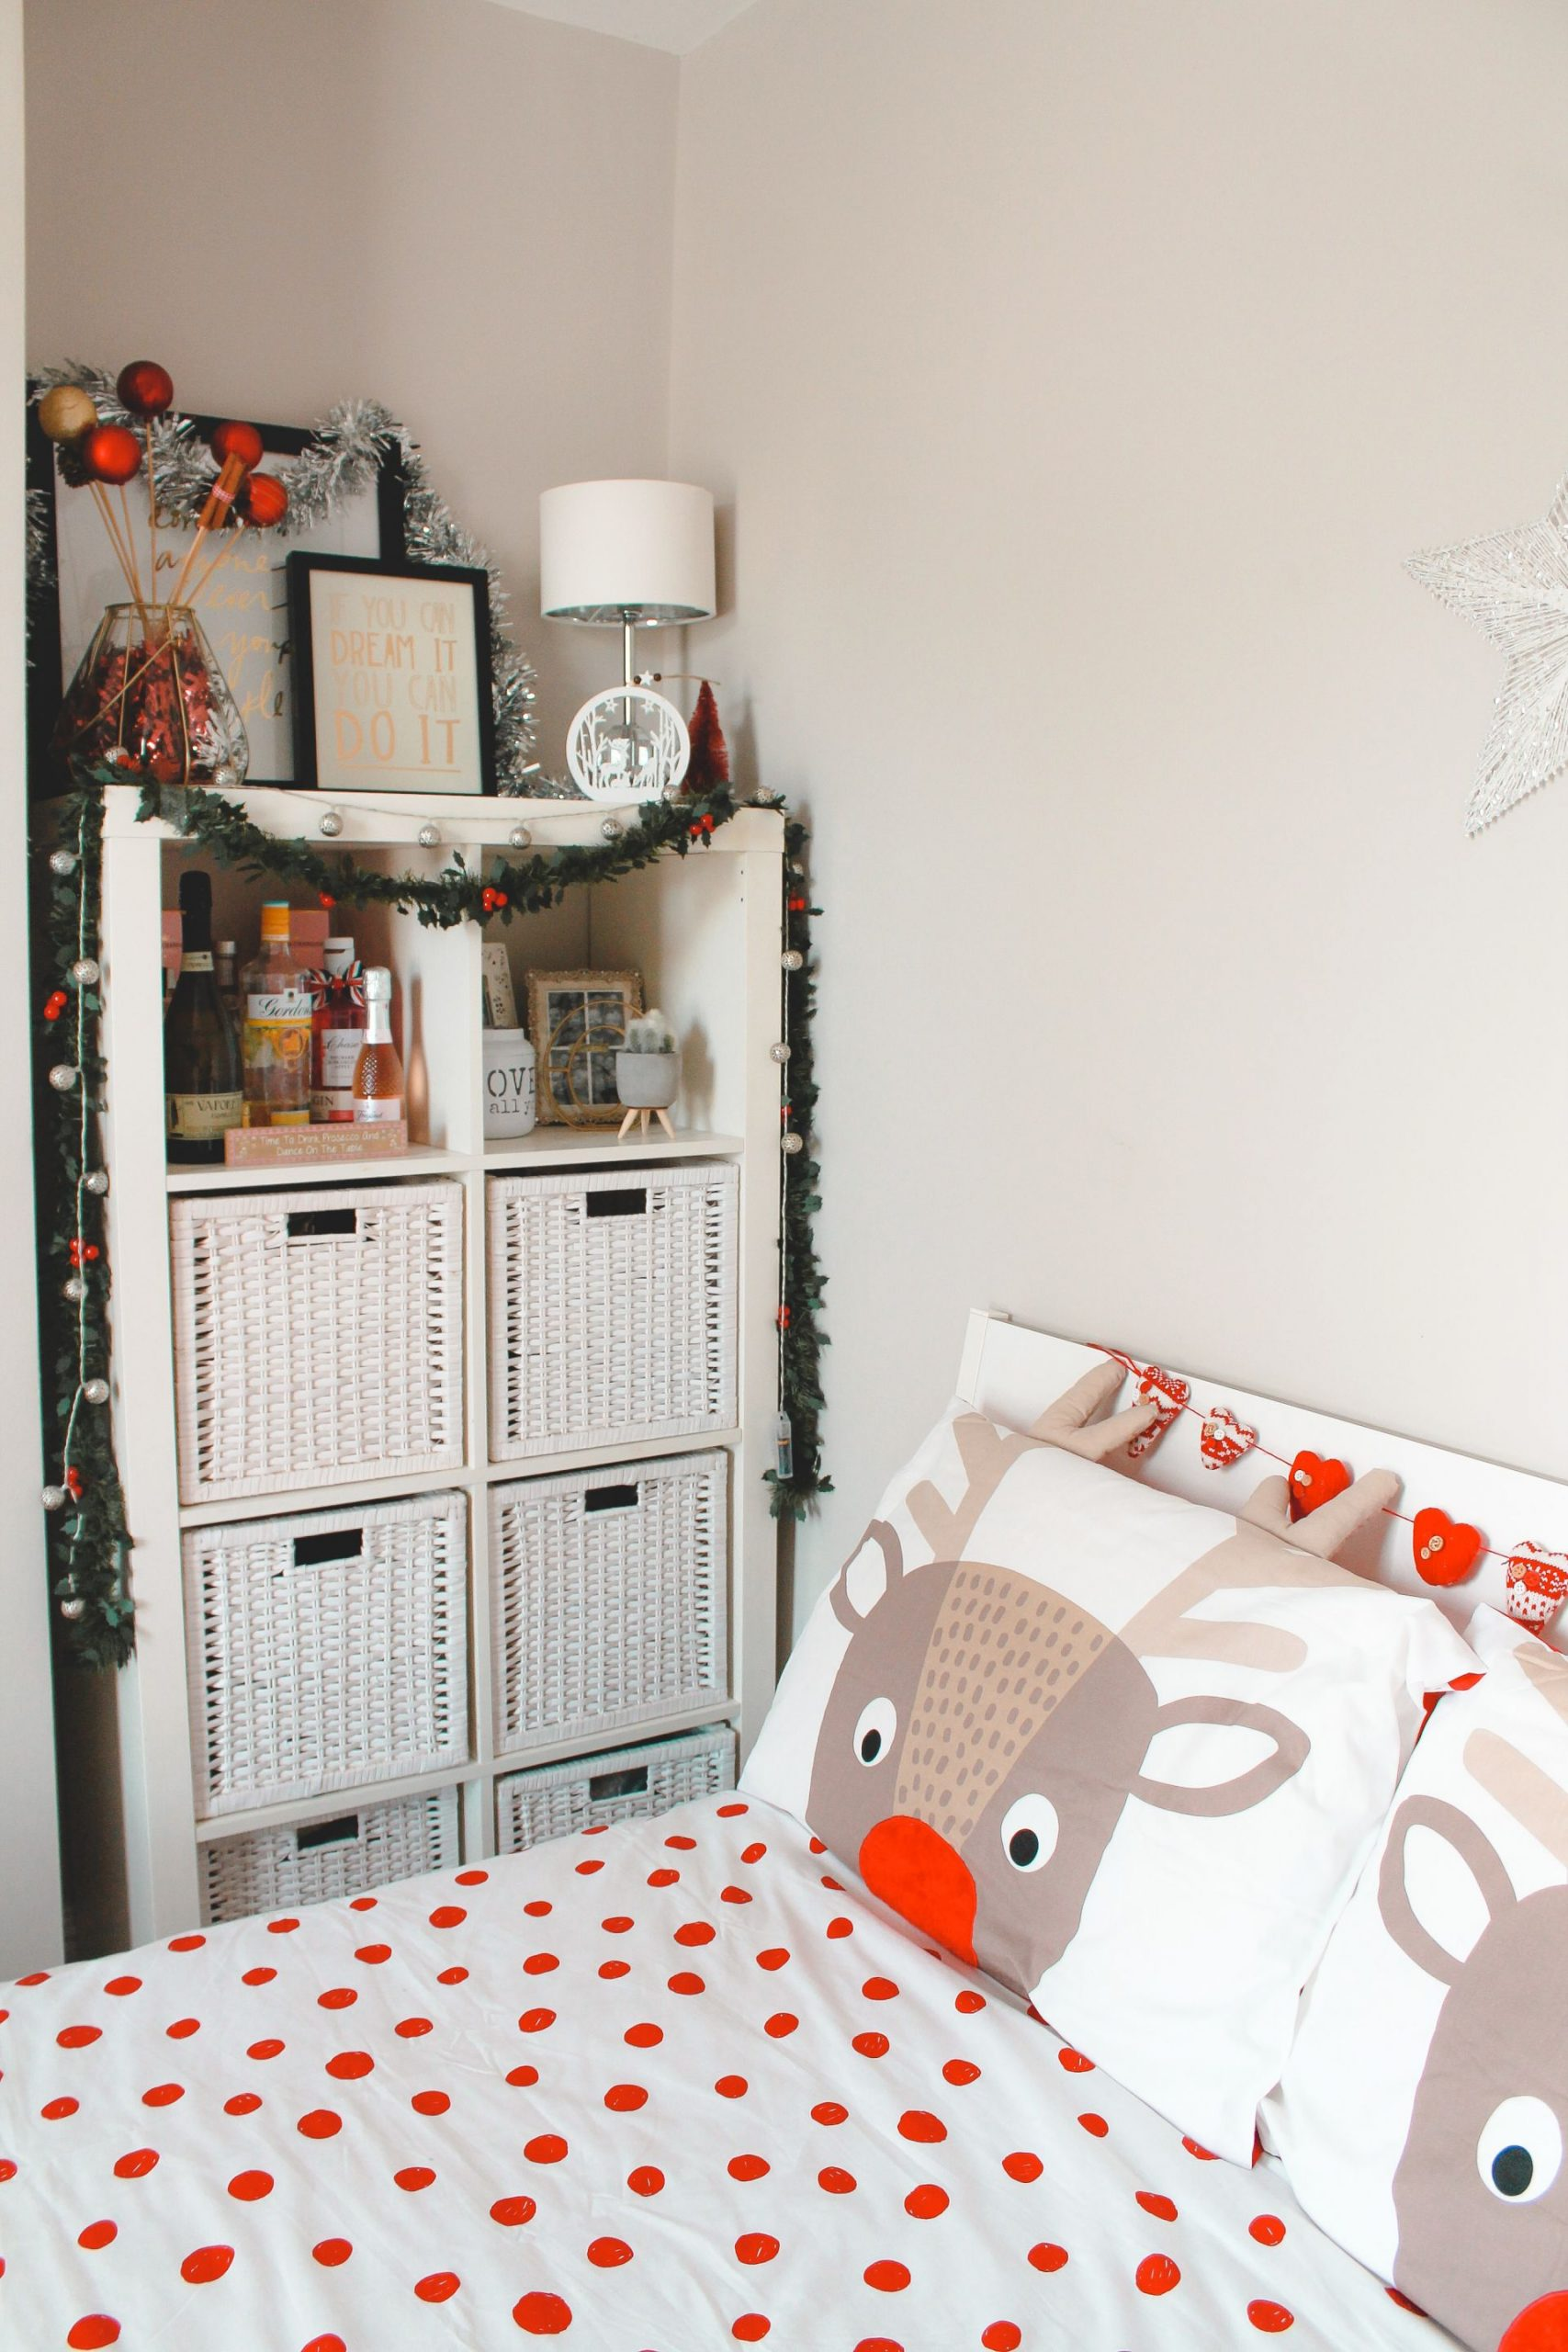 decorating for christmas on a budget, christmas bedding,